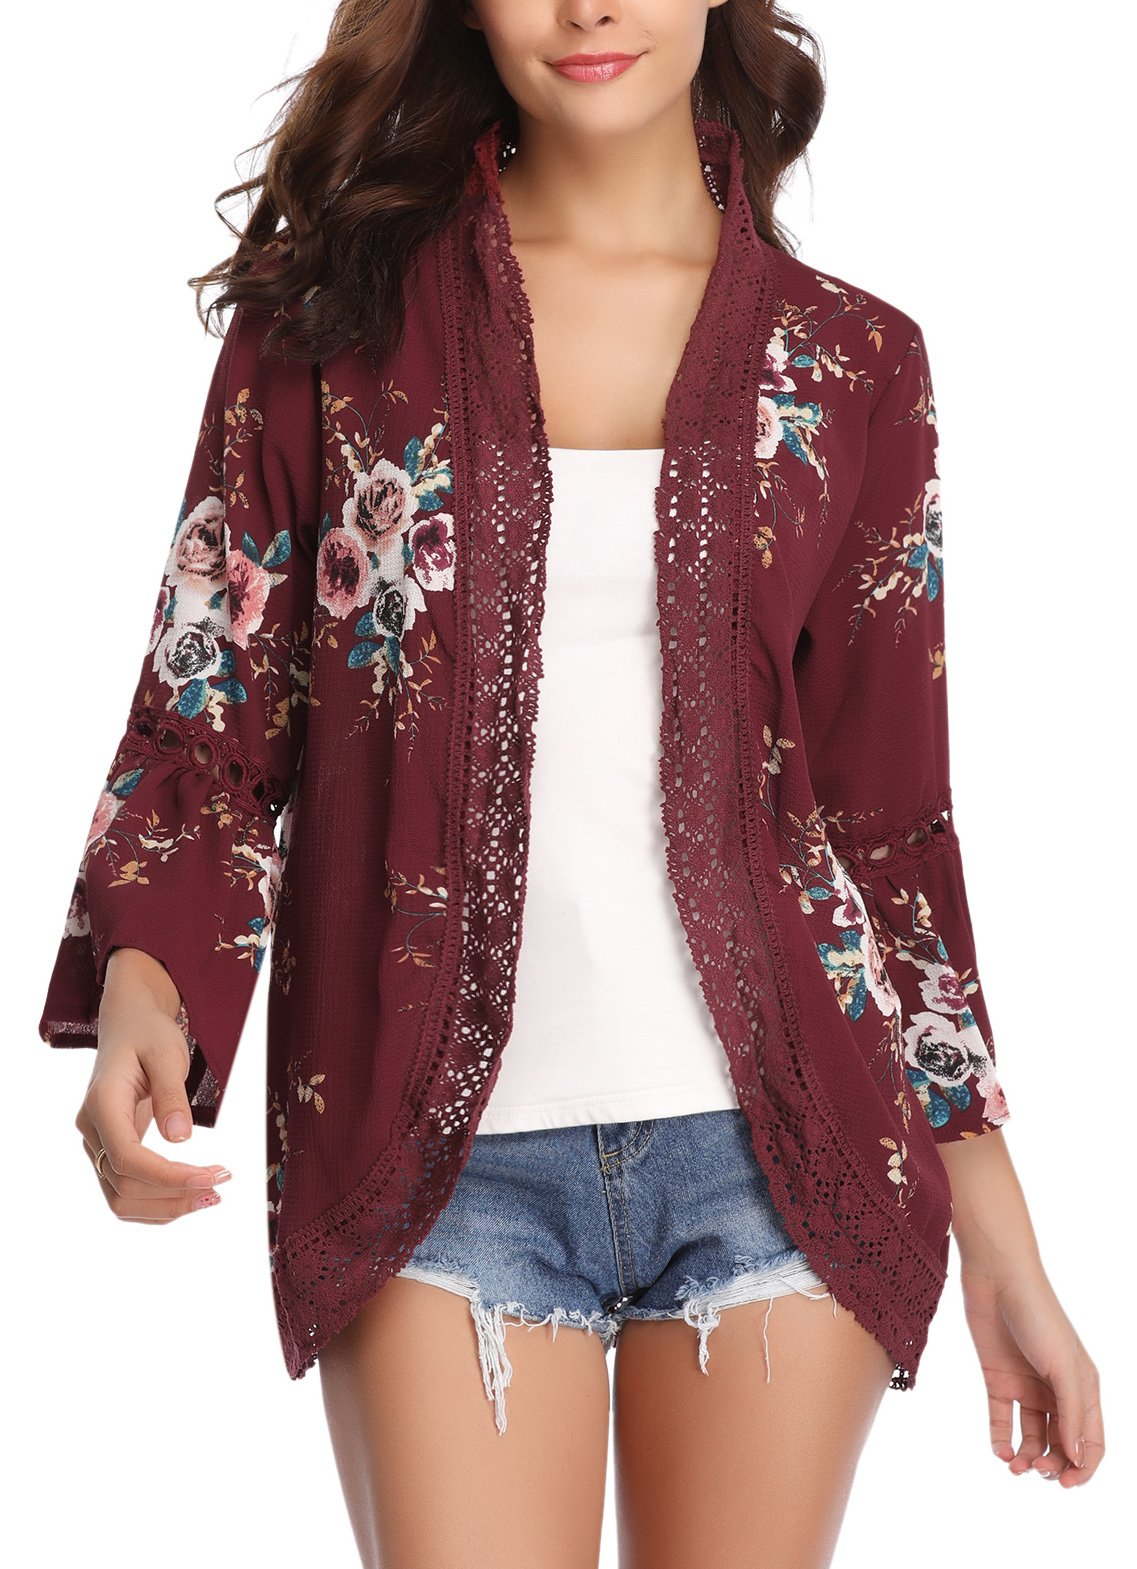 iClosam Women 3/4 Sleeve Floral Chiffon Kimono Cover Up Cardigan